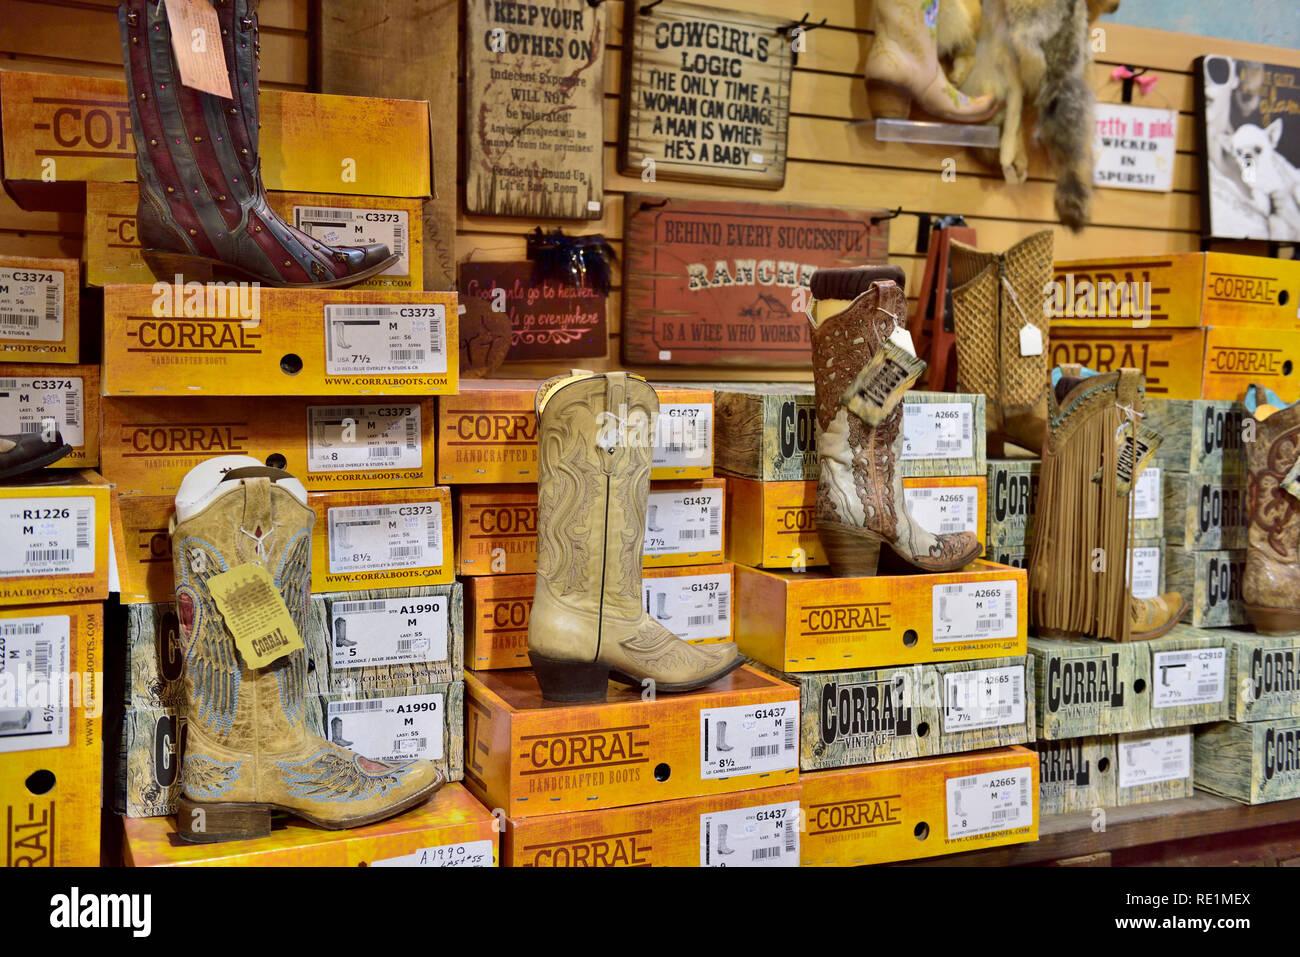 Cowboy Boots Shoes Stock Photos Amp Cowboy Boots Shoes Stock